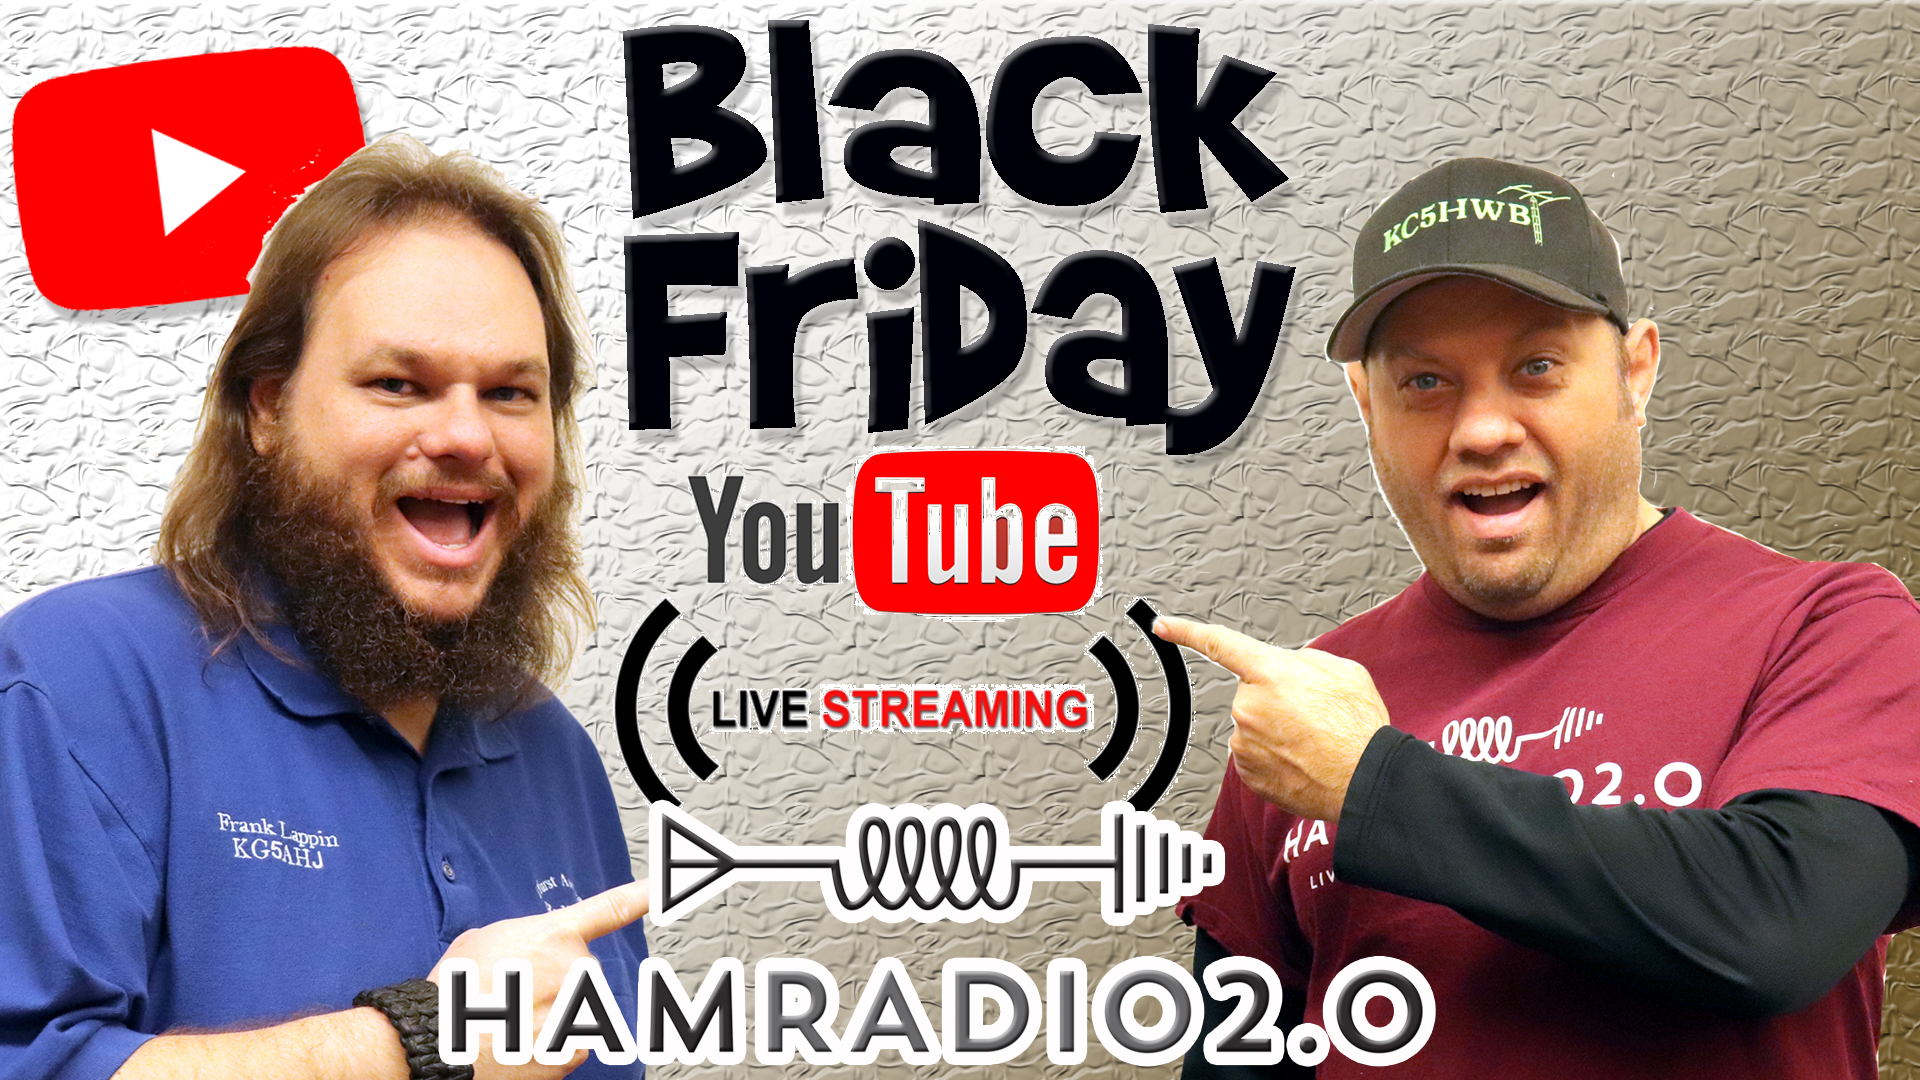 Episode 501: BLACK FRIDAY Livestream for Ham Radio Equipment